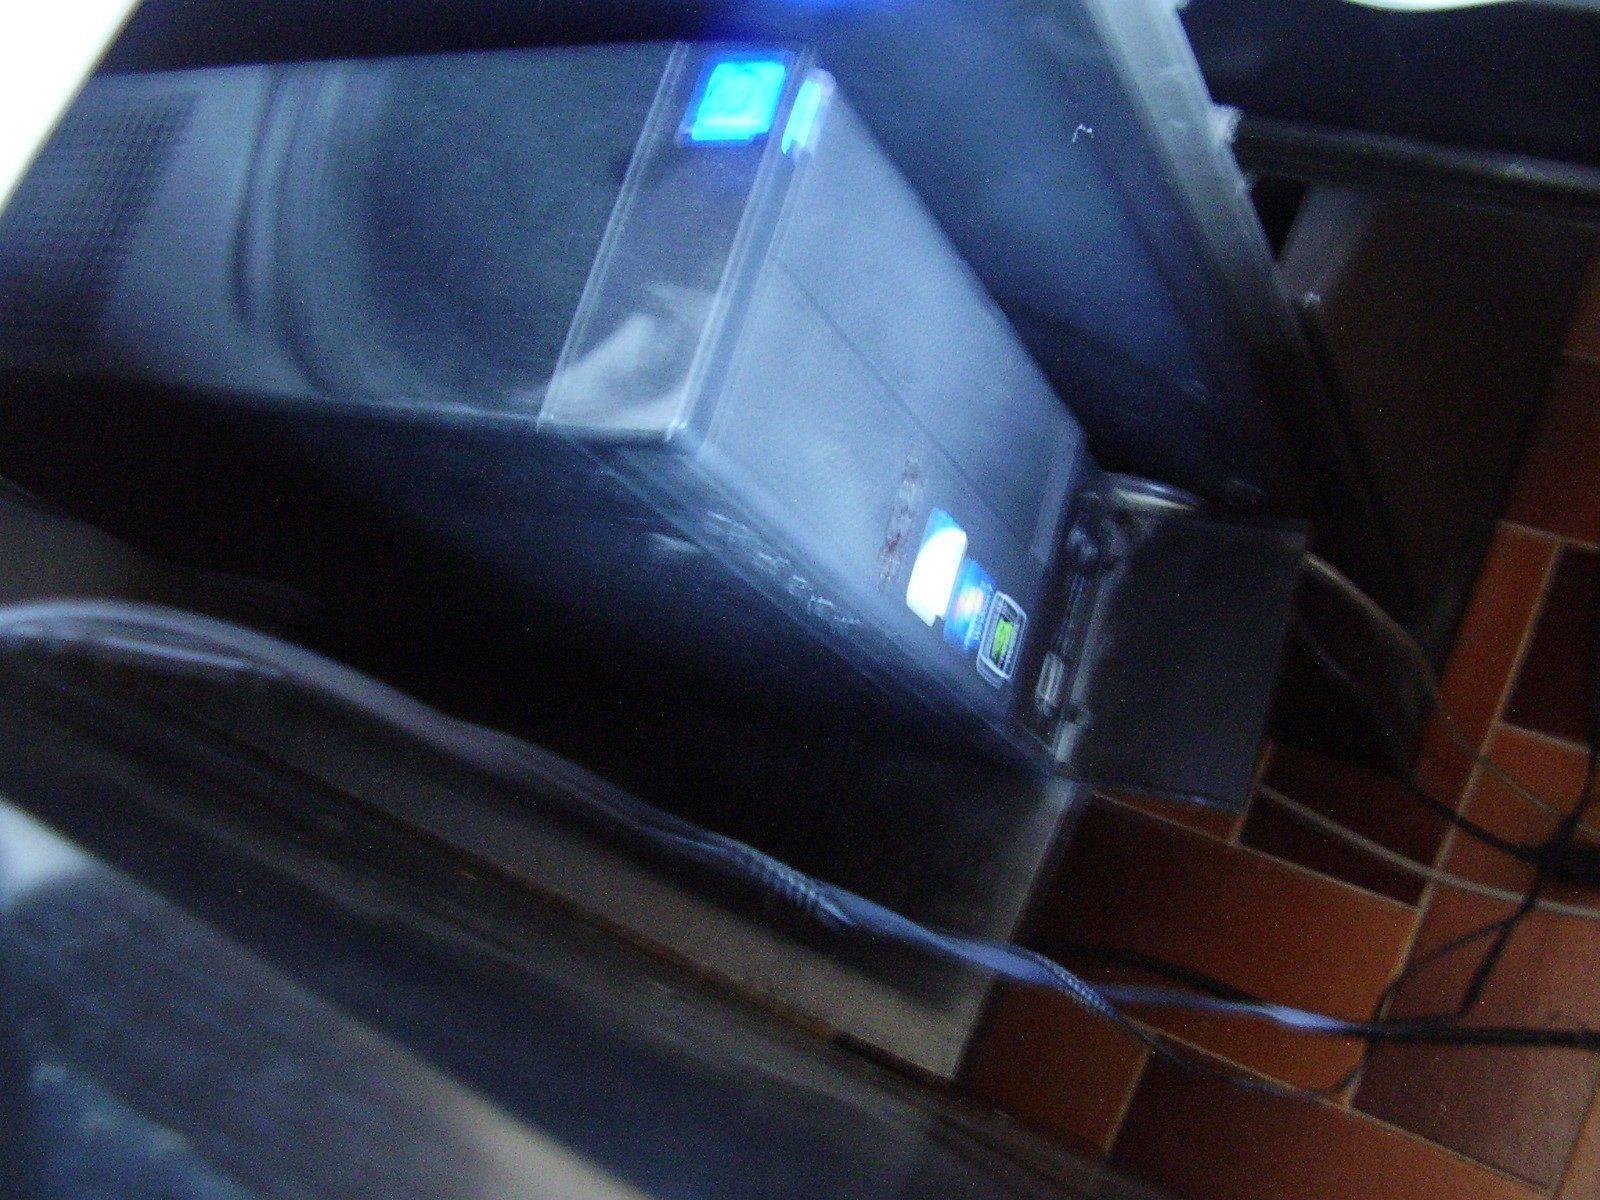 PC060010.JPG